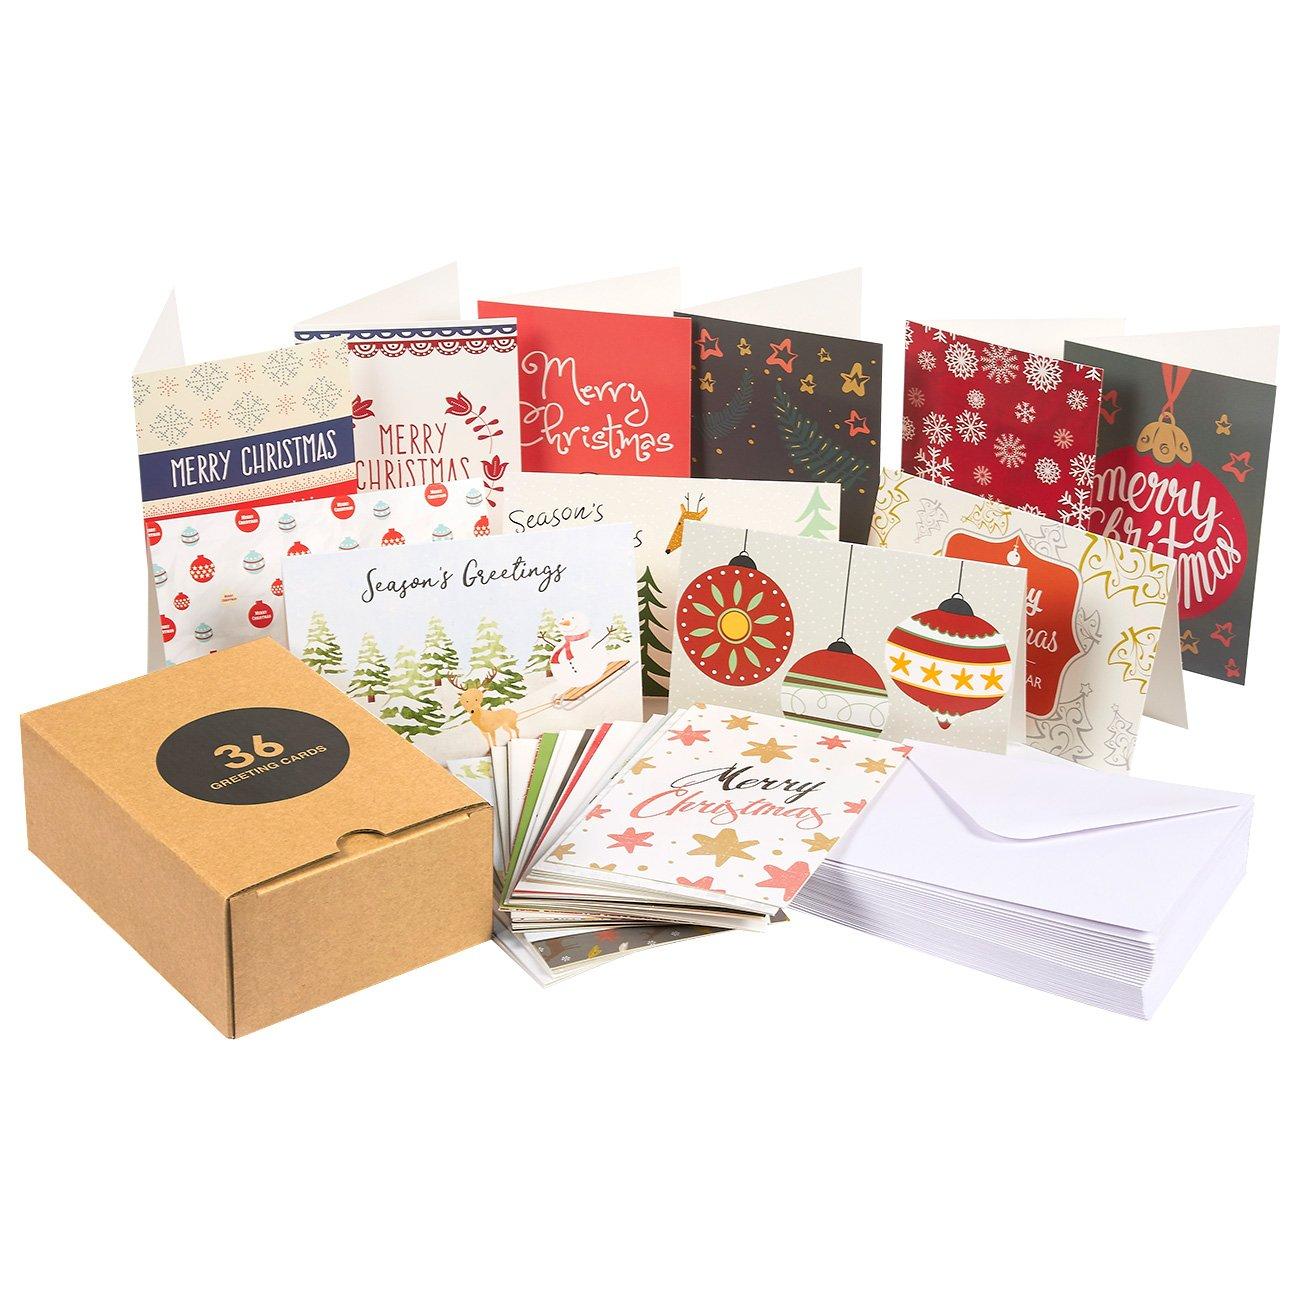 Amazon.com : 36-Pack Merry Christmas Holiday Greeting Cards Bulk Box ...